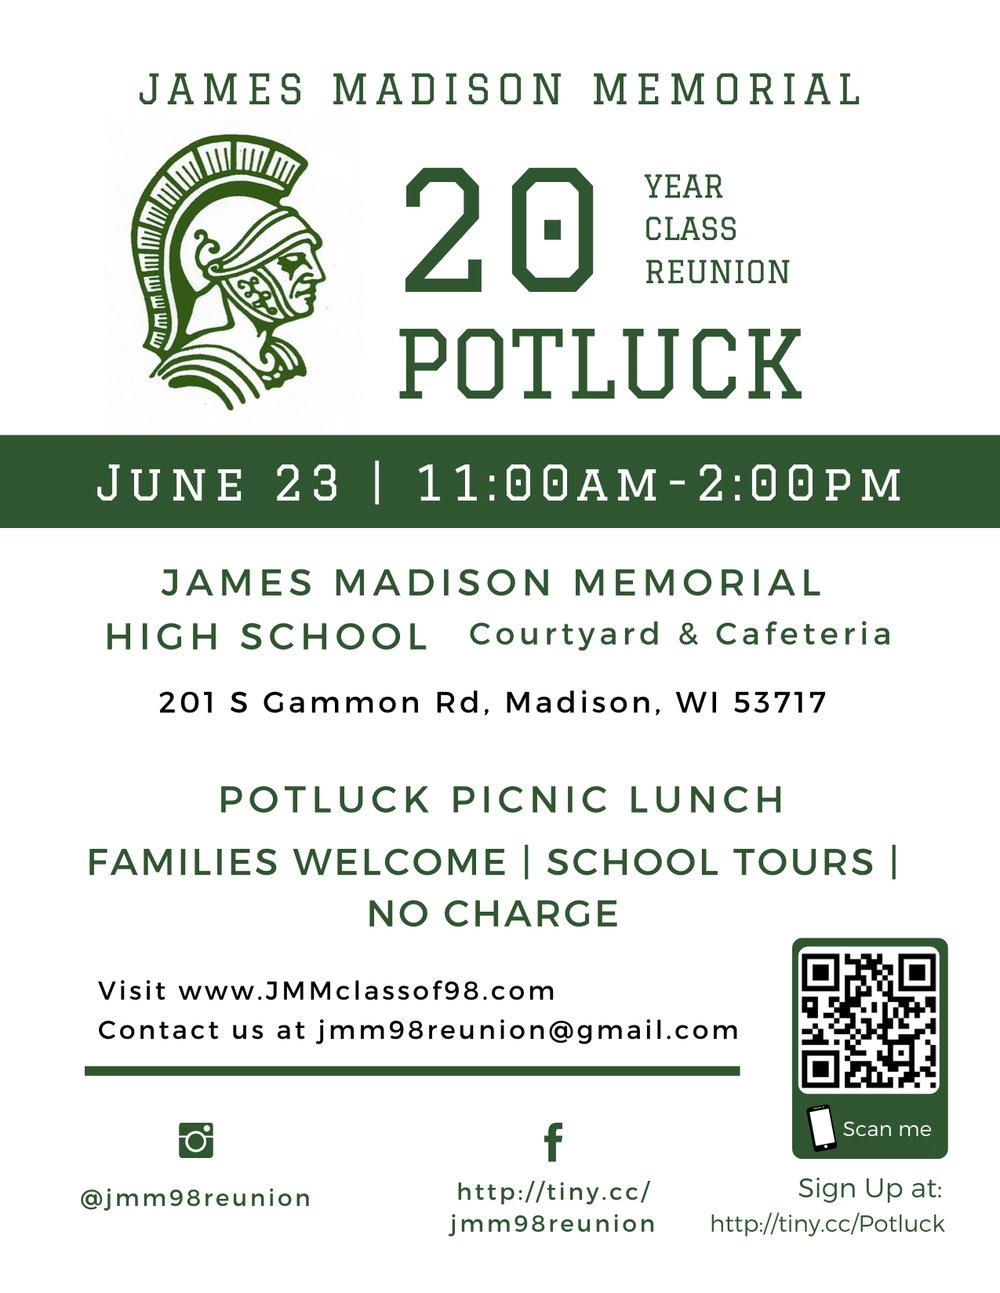 Potluck Picnic Lunch copy.jpg